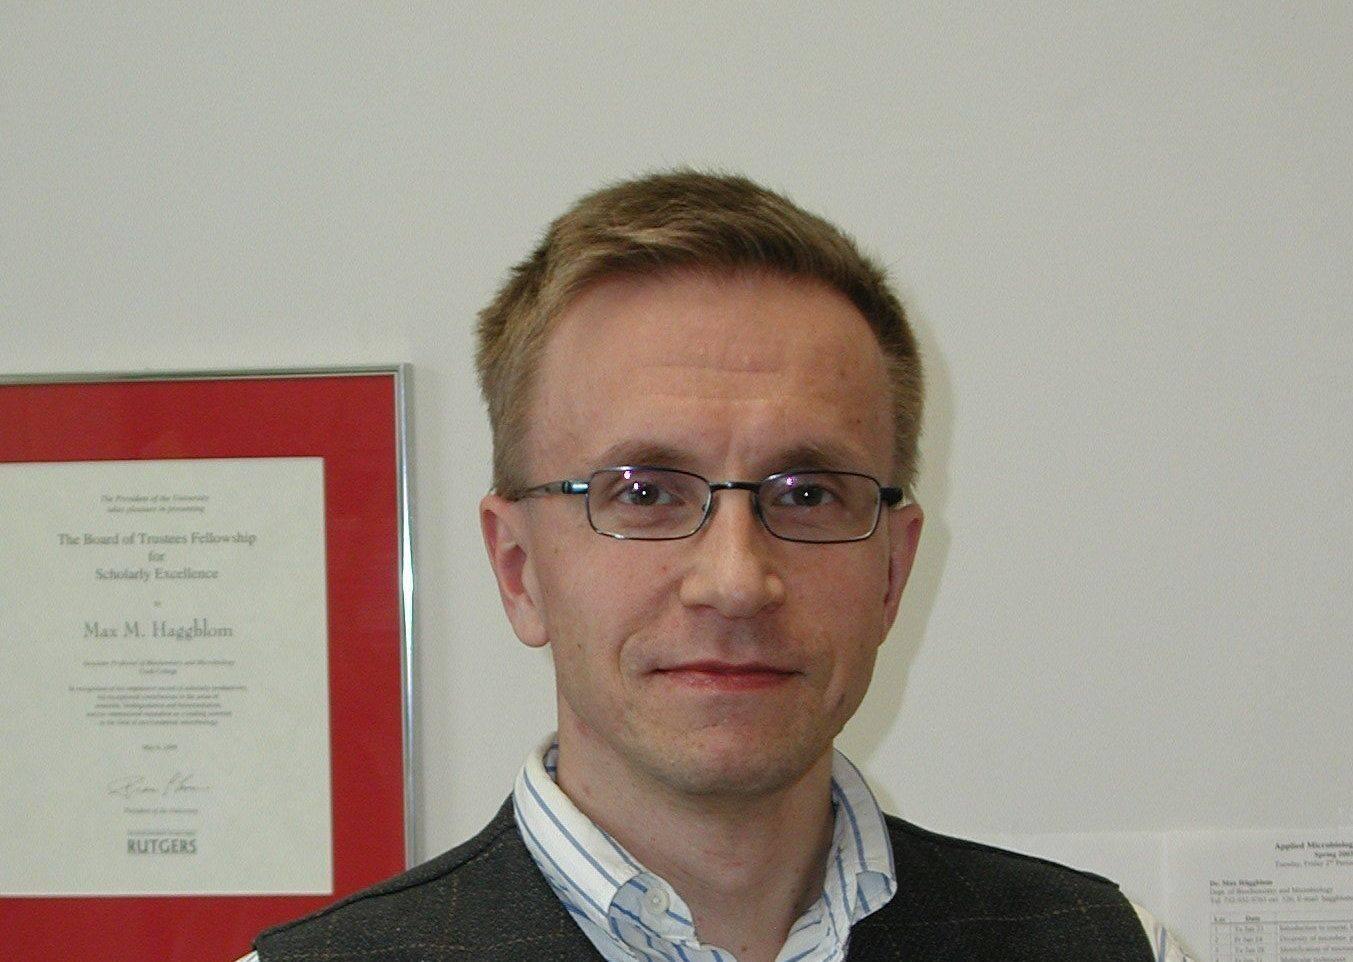 Max Haggblom